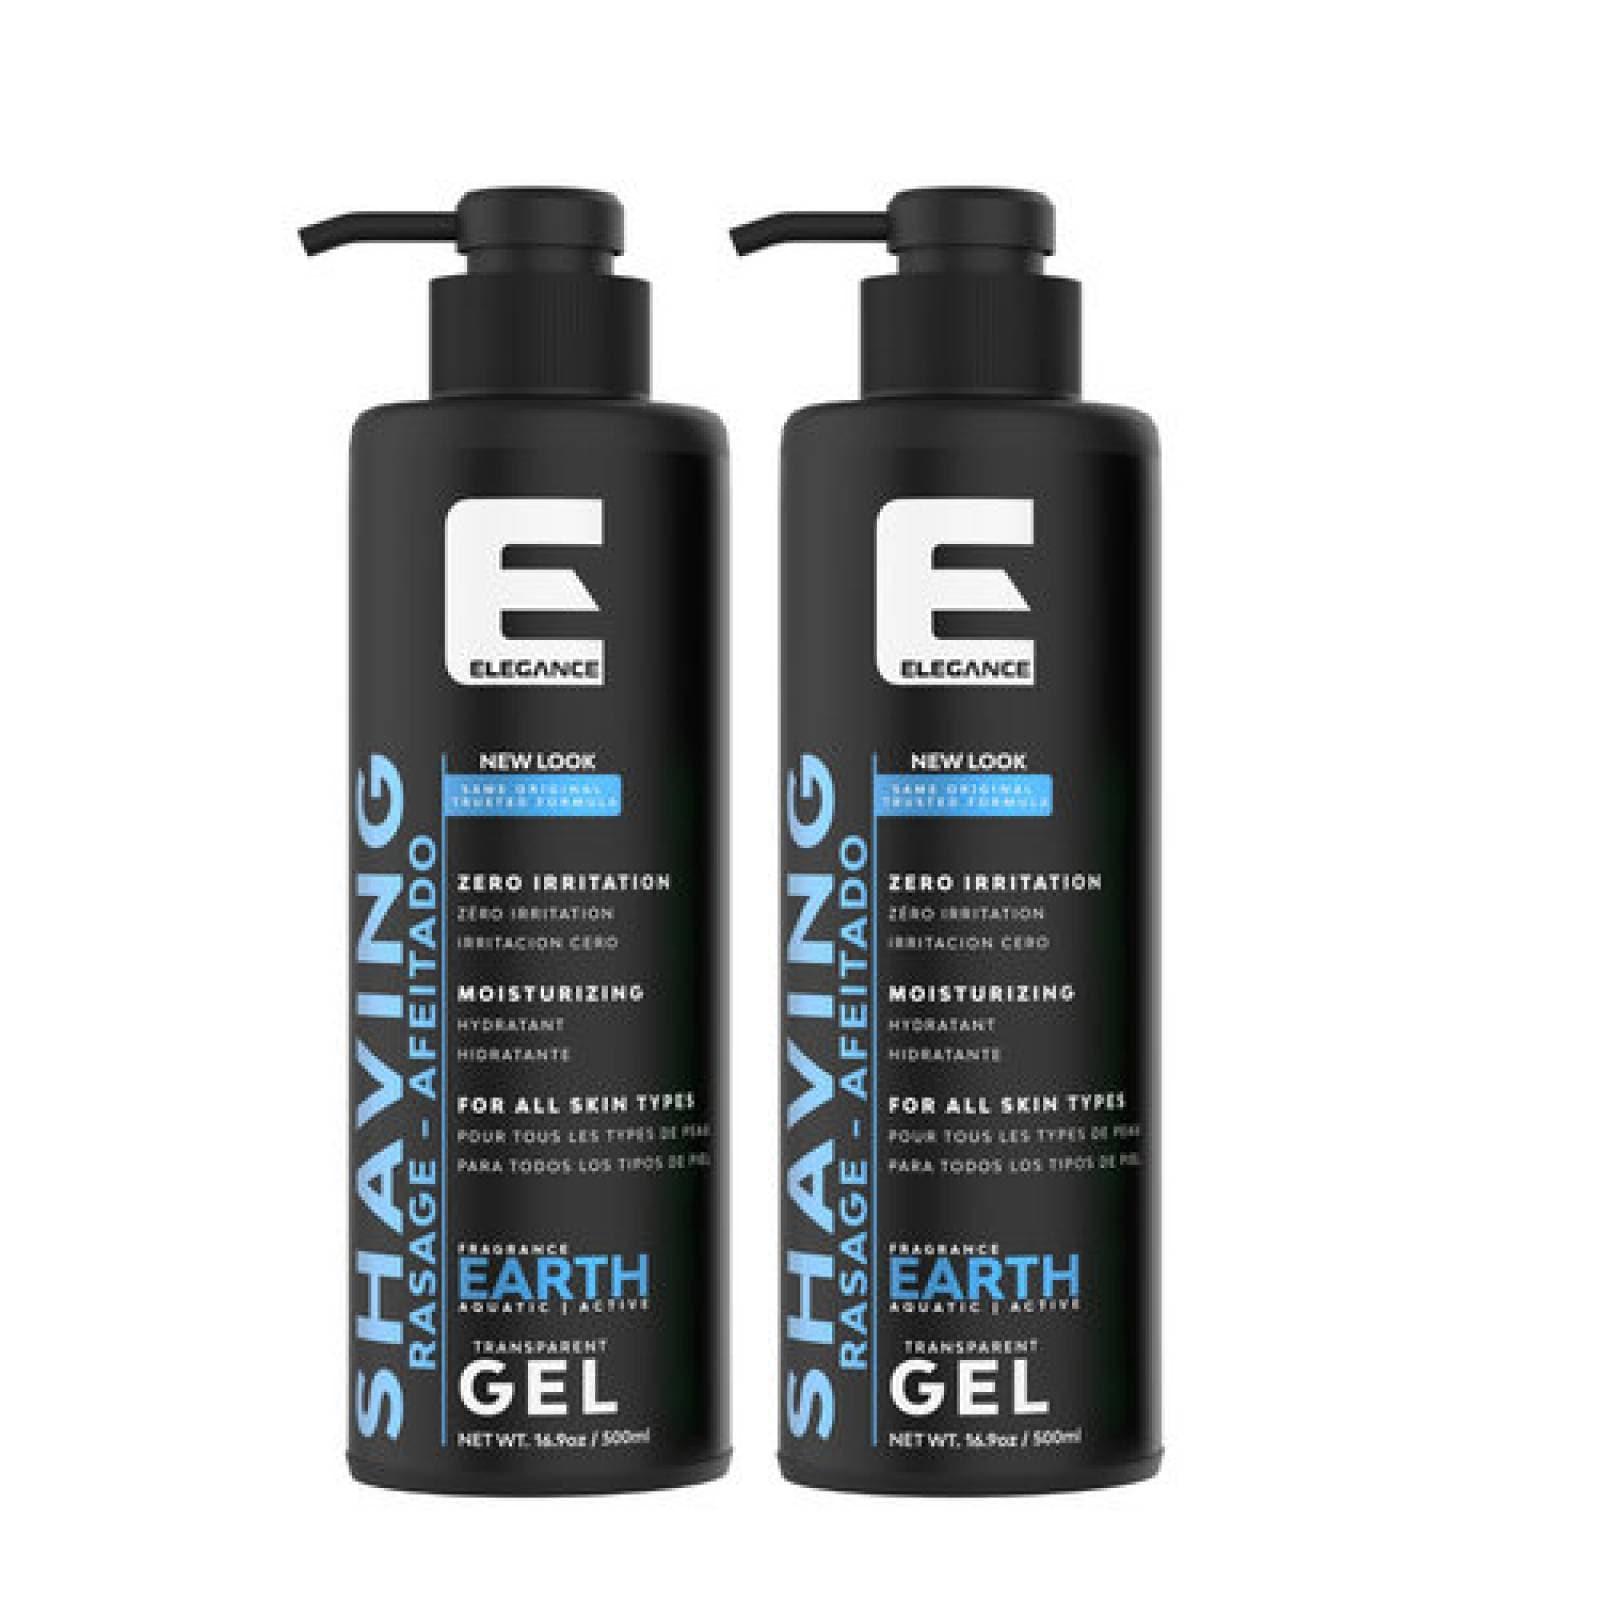 Gel de Afeitar Elegance Earth 500 ml ,  Gel para Afeitado.